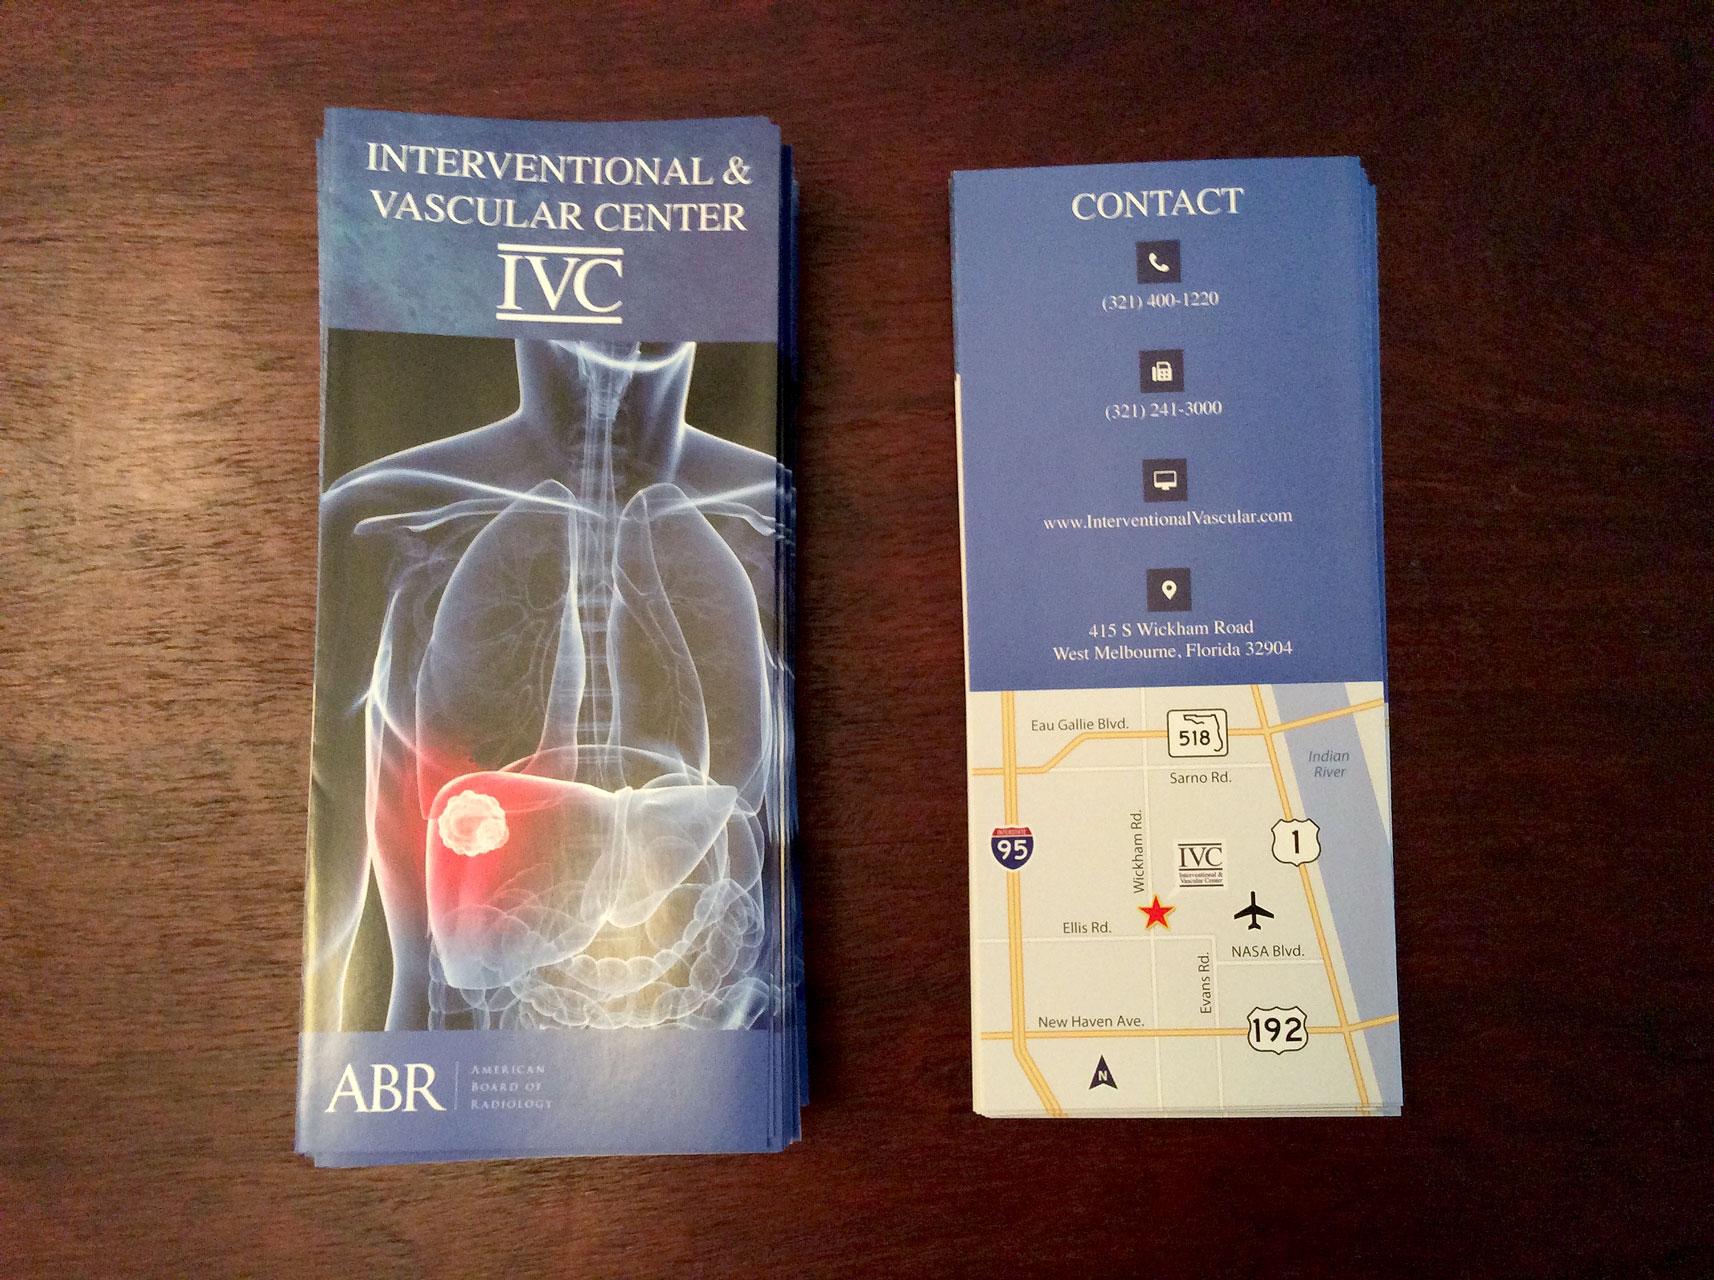 New Trifolds for the Interventional & Vascular Center (IVC) 02